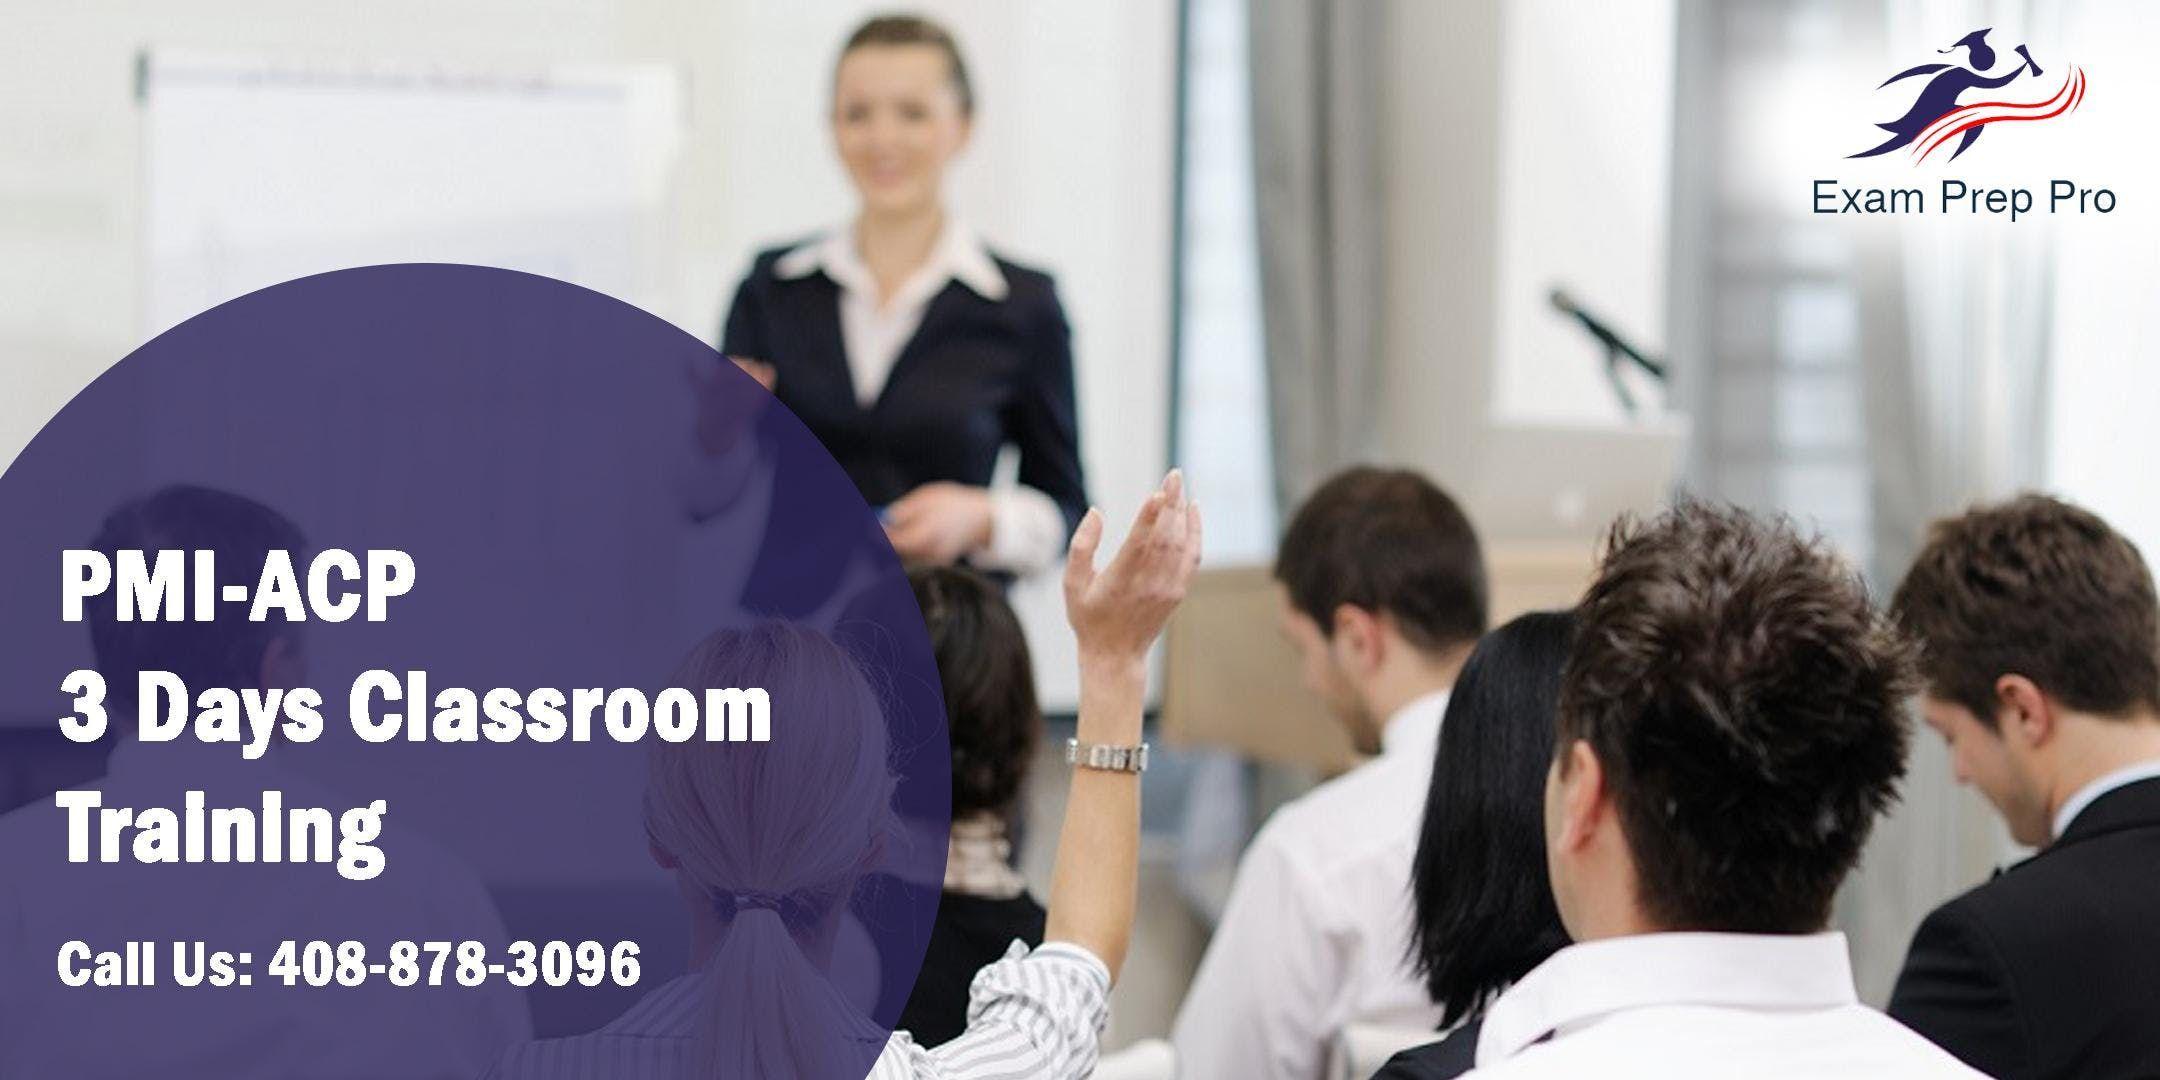 PMI-ACP 3 Days Classroom Training in CharlotteNC